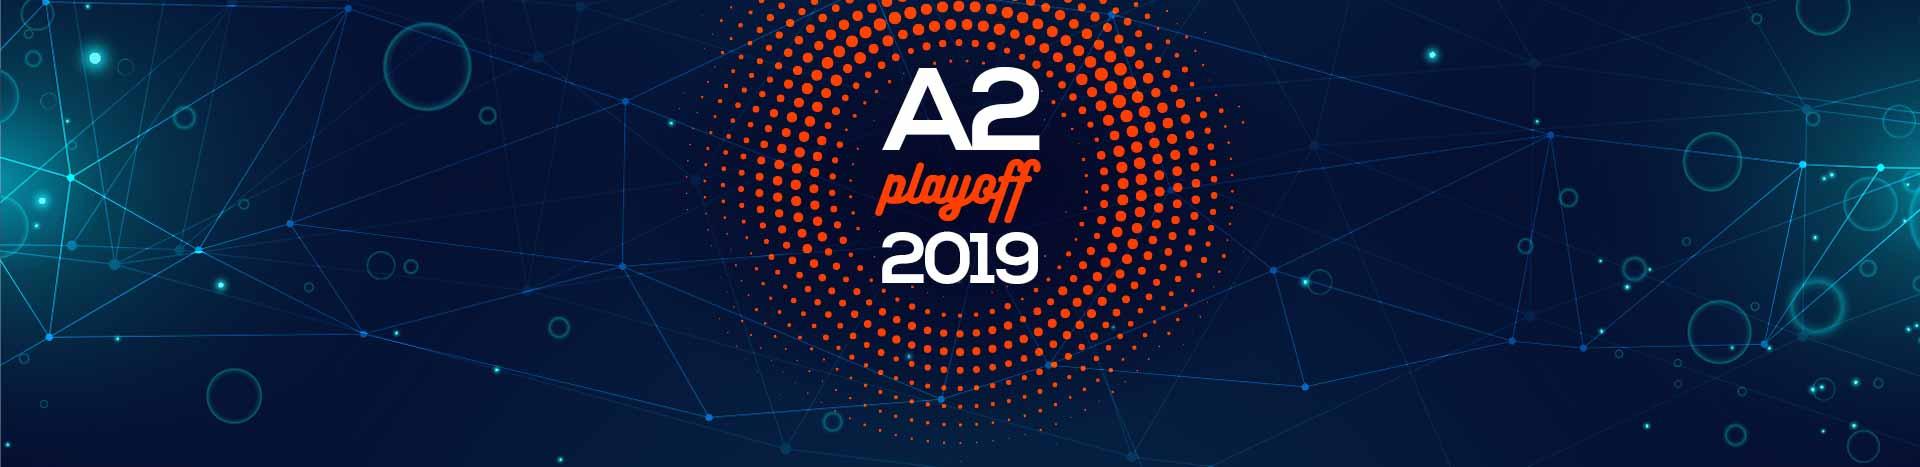 A2 Playoff 2019 – Finale, Gara1: Treviso si porta in vantaggio su Capo d'Orlando